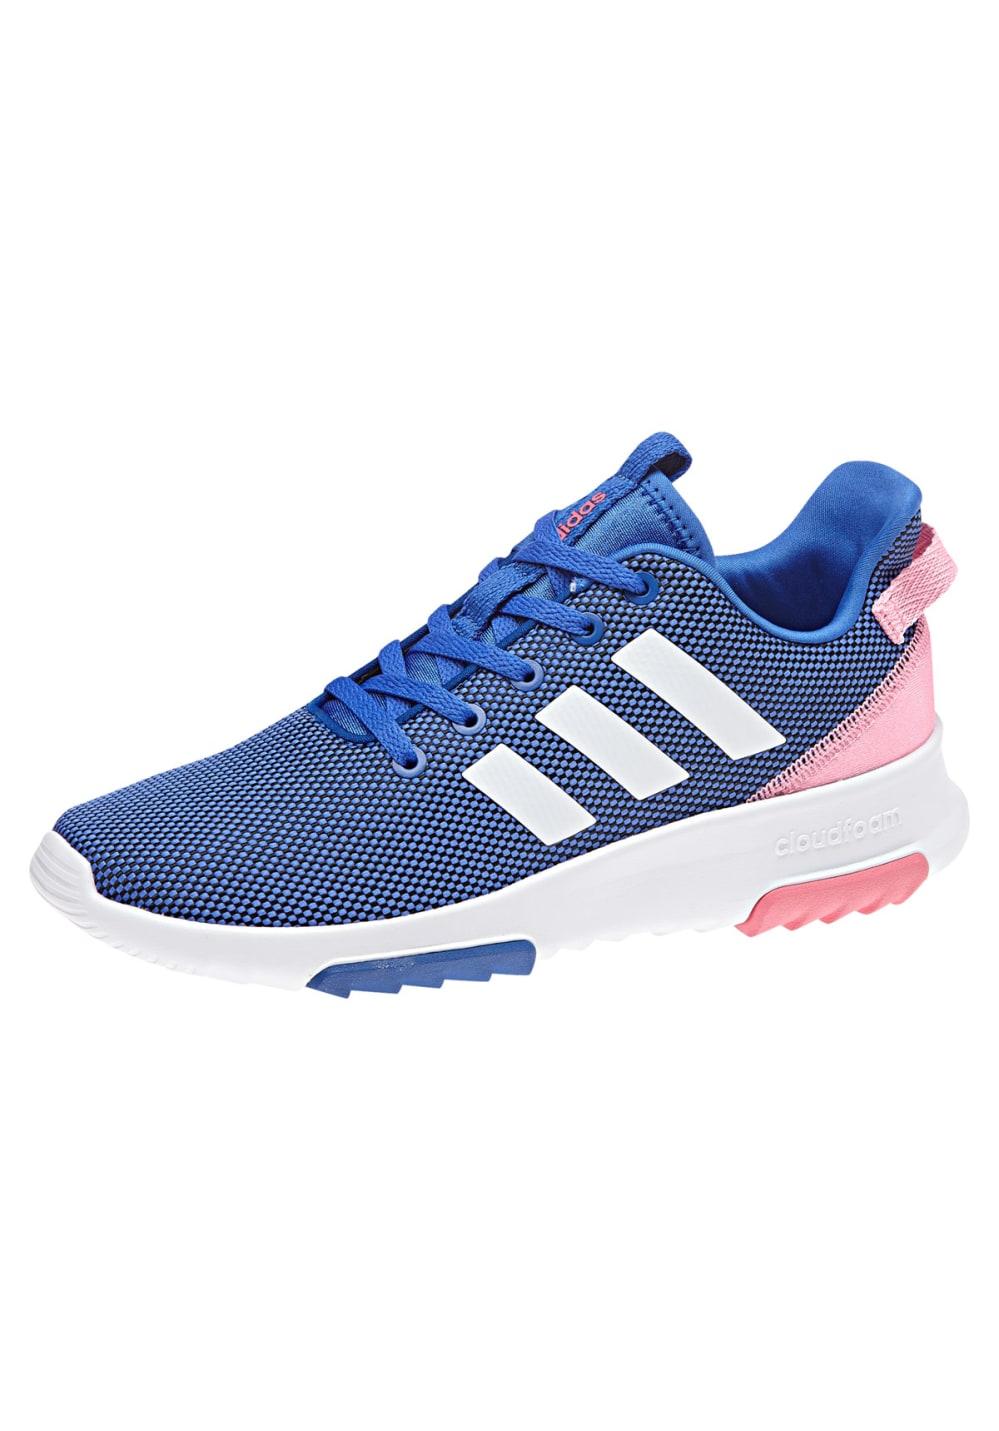 Cf Racer Tr Neo K Adidas Chaussures Running Bleu sQhrdtC